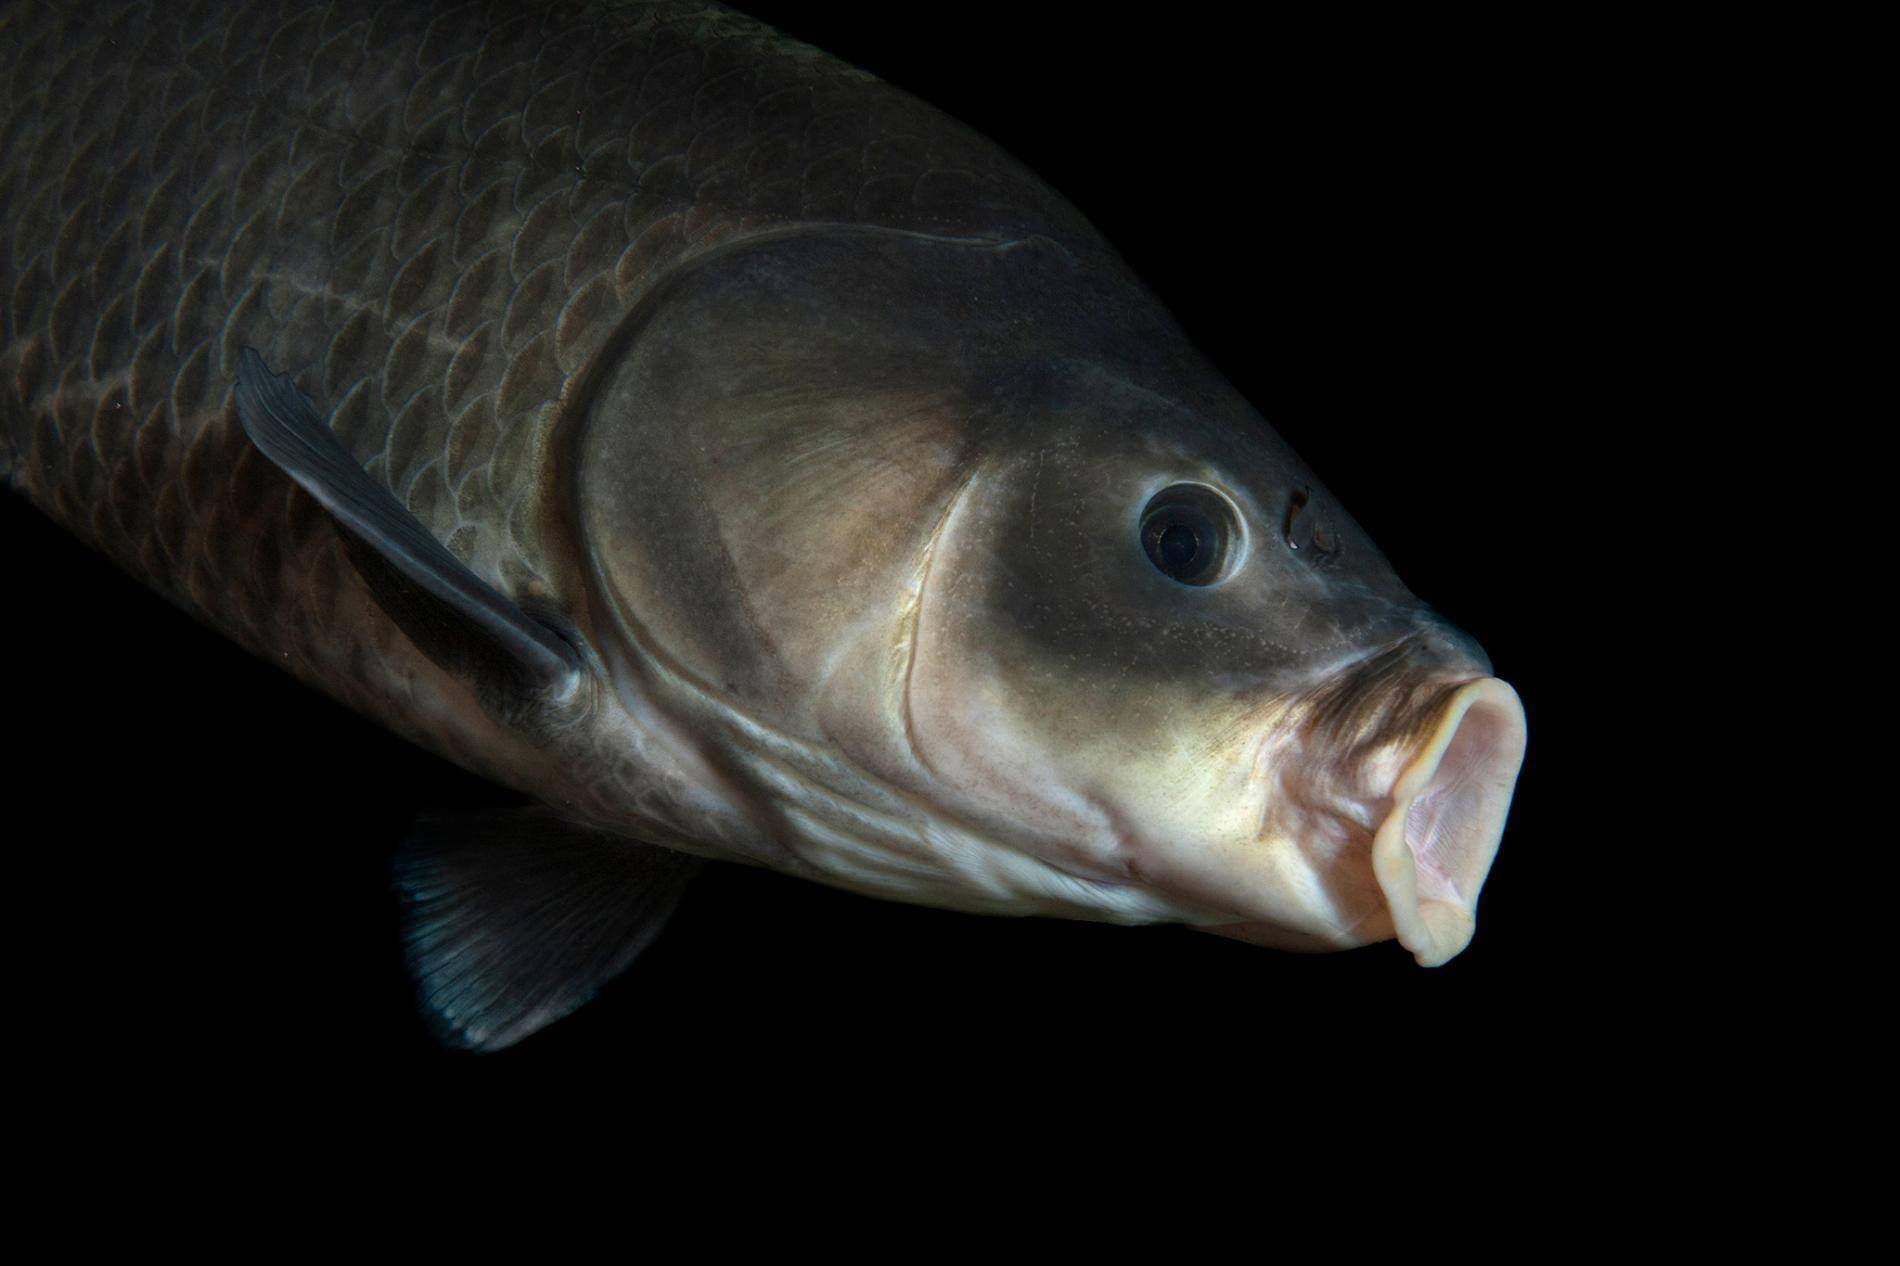 Буффало: описание, разновидности, места обитания | клёвая рыбалка